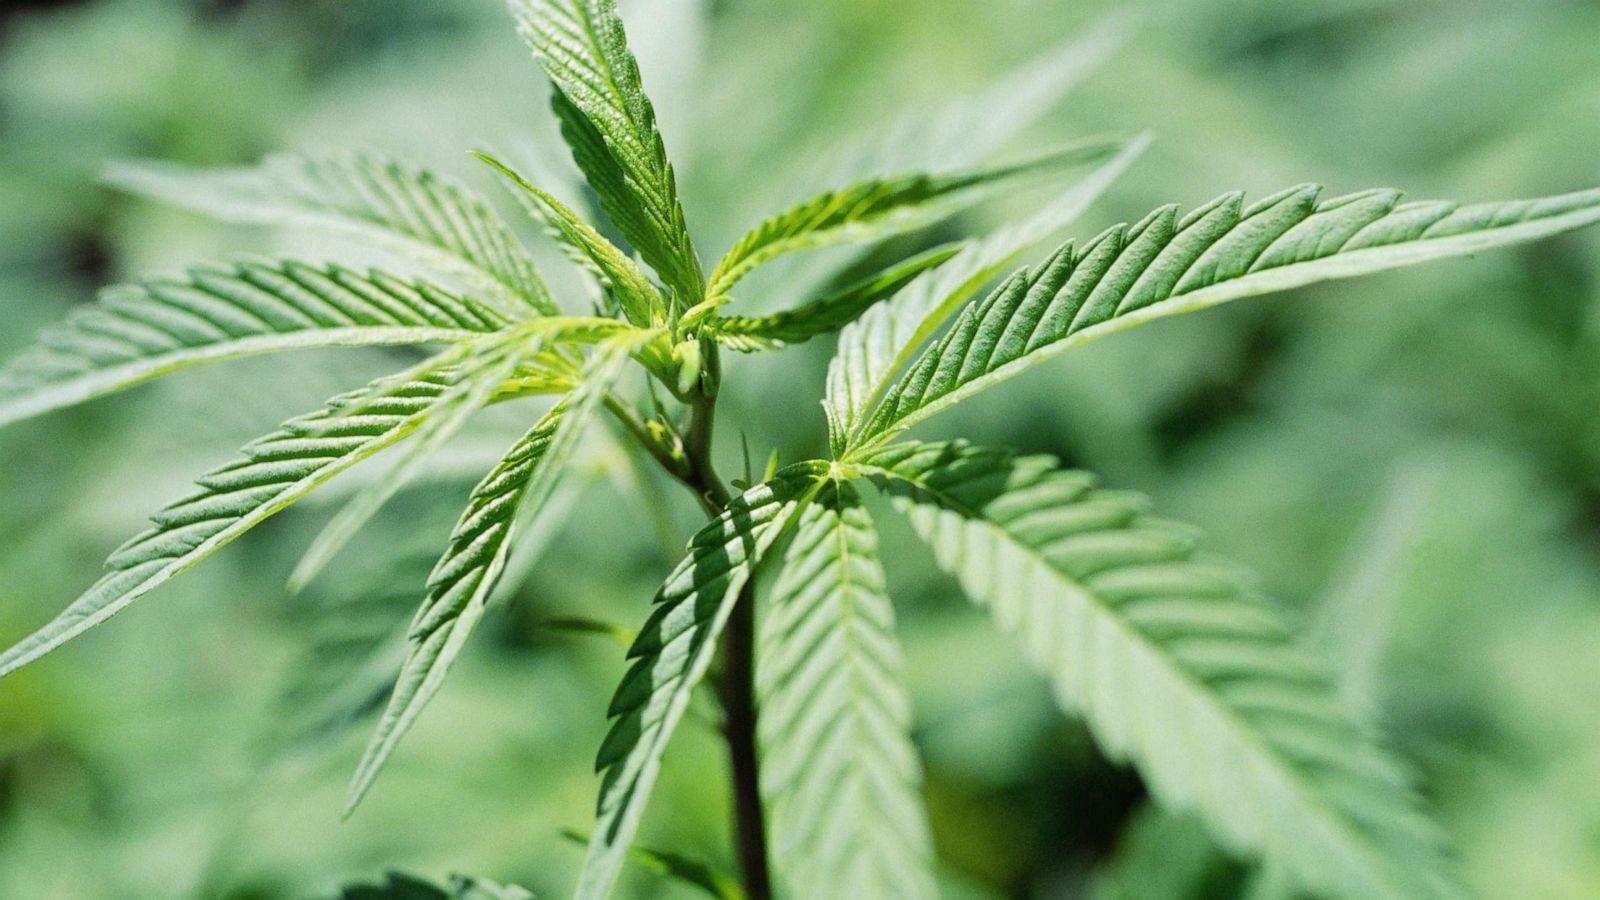 Картинка с марихуаной украина наркотики марихуана